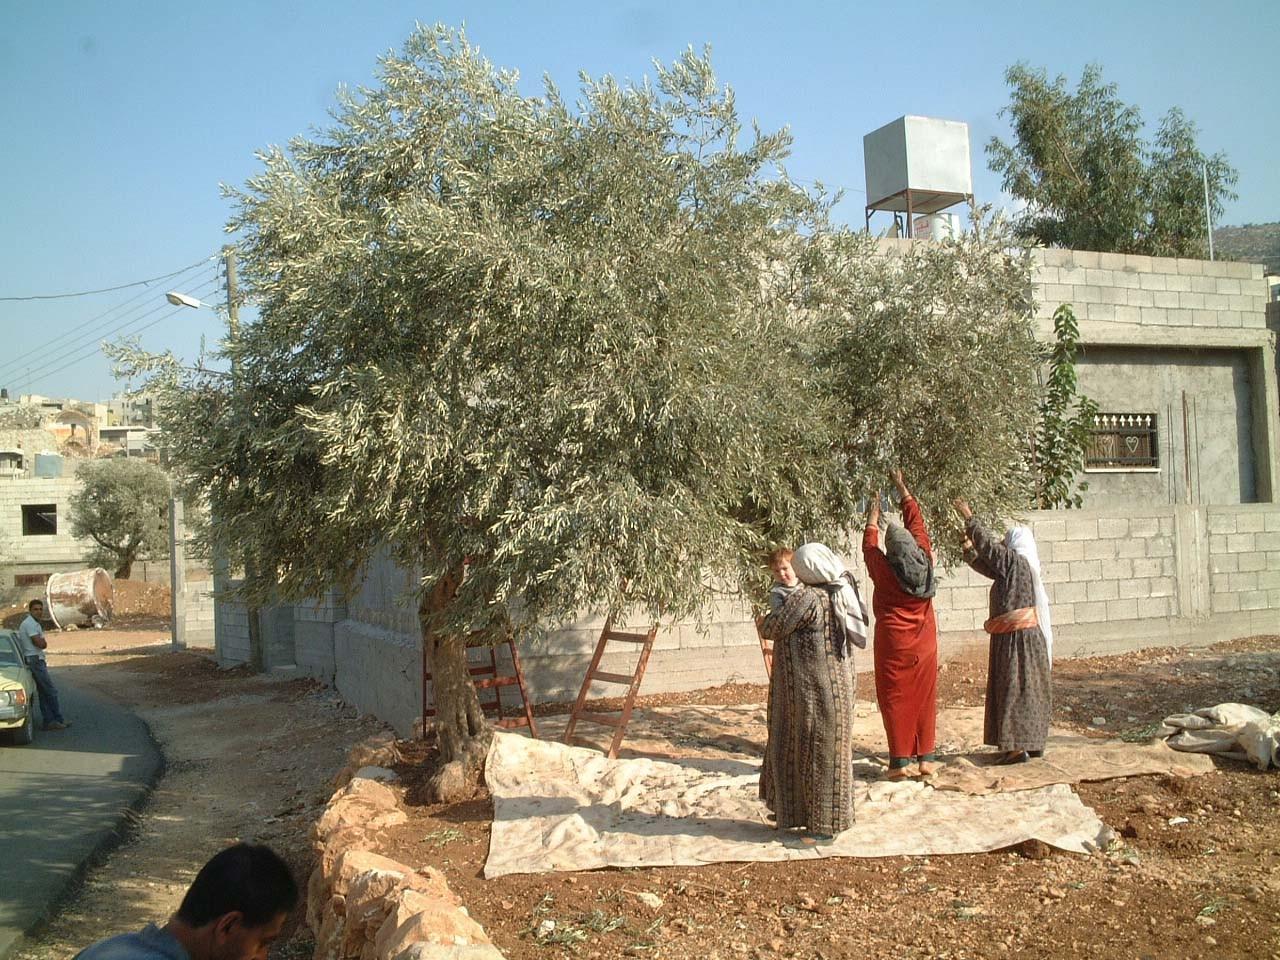 【PtoP NEWS vol.07.201610 特集】パレスチナ人民連帯国際デー